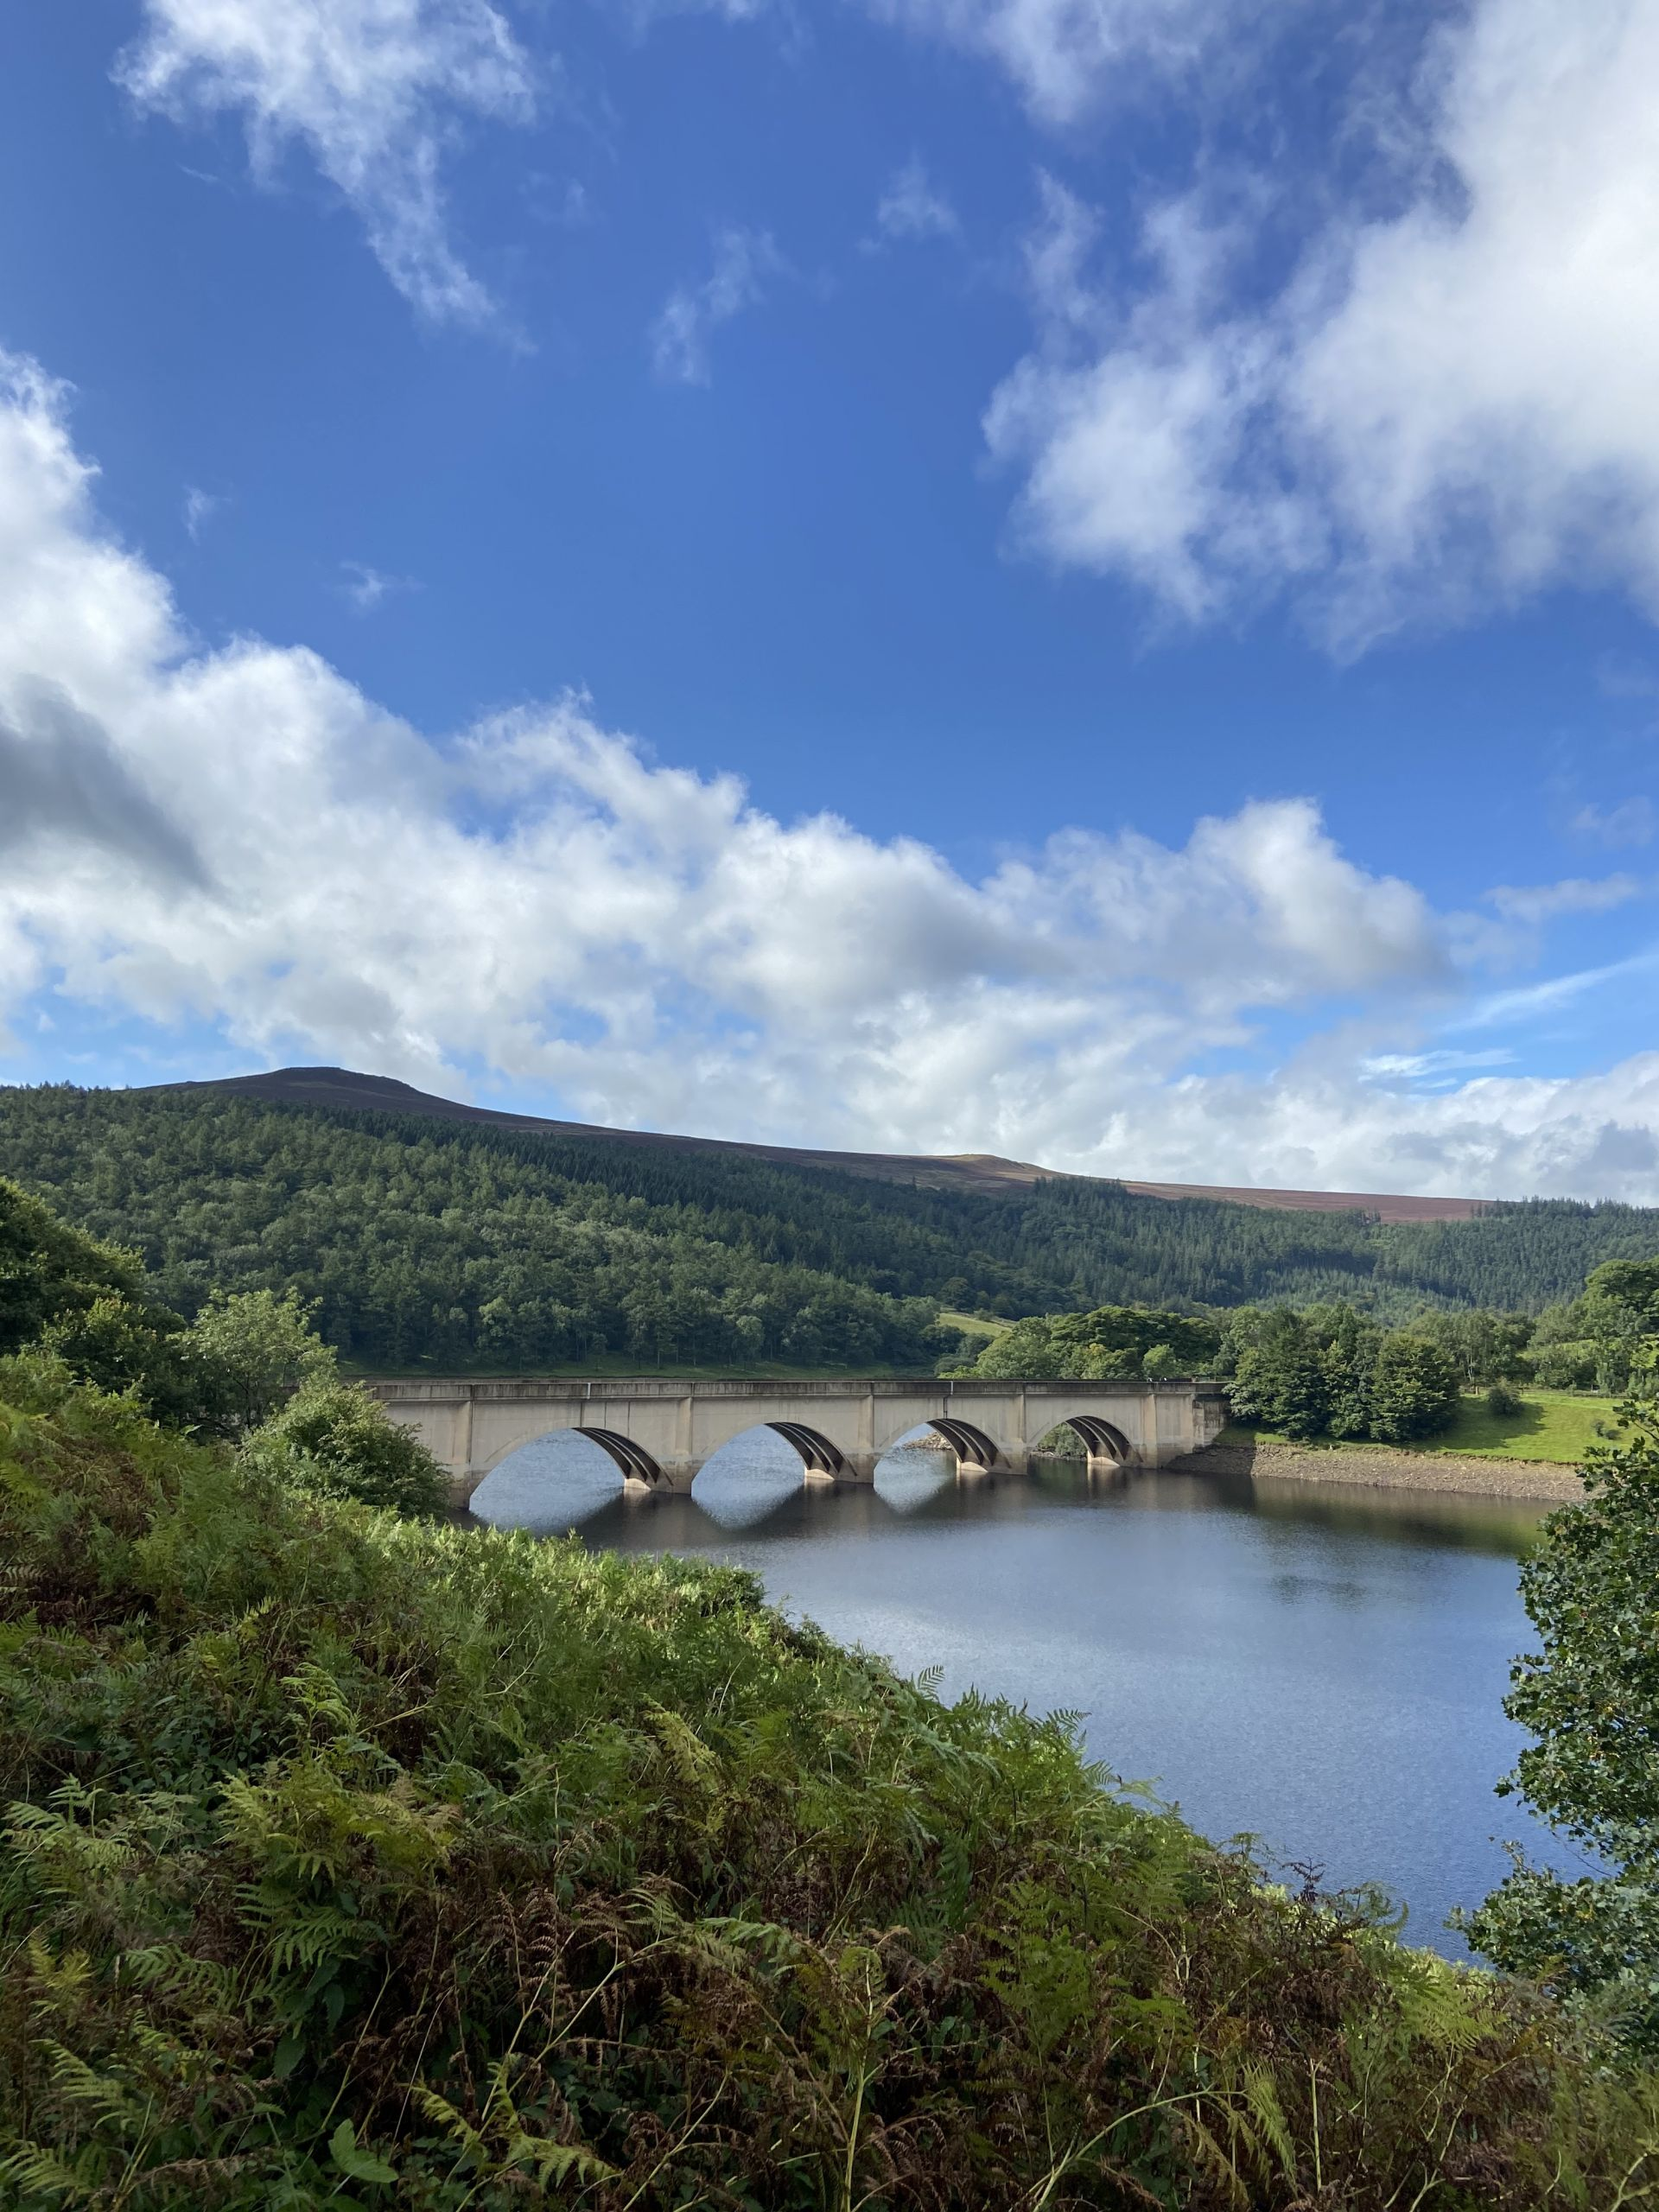 Ladybower reservoir in the Peak District